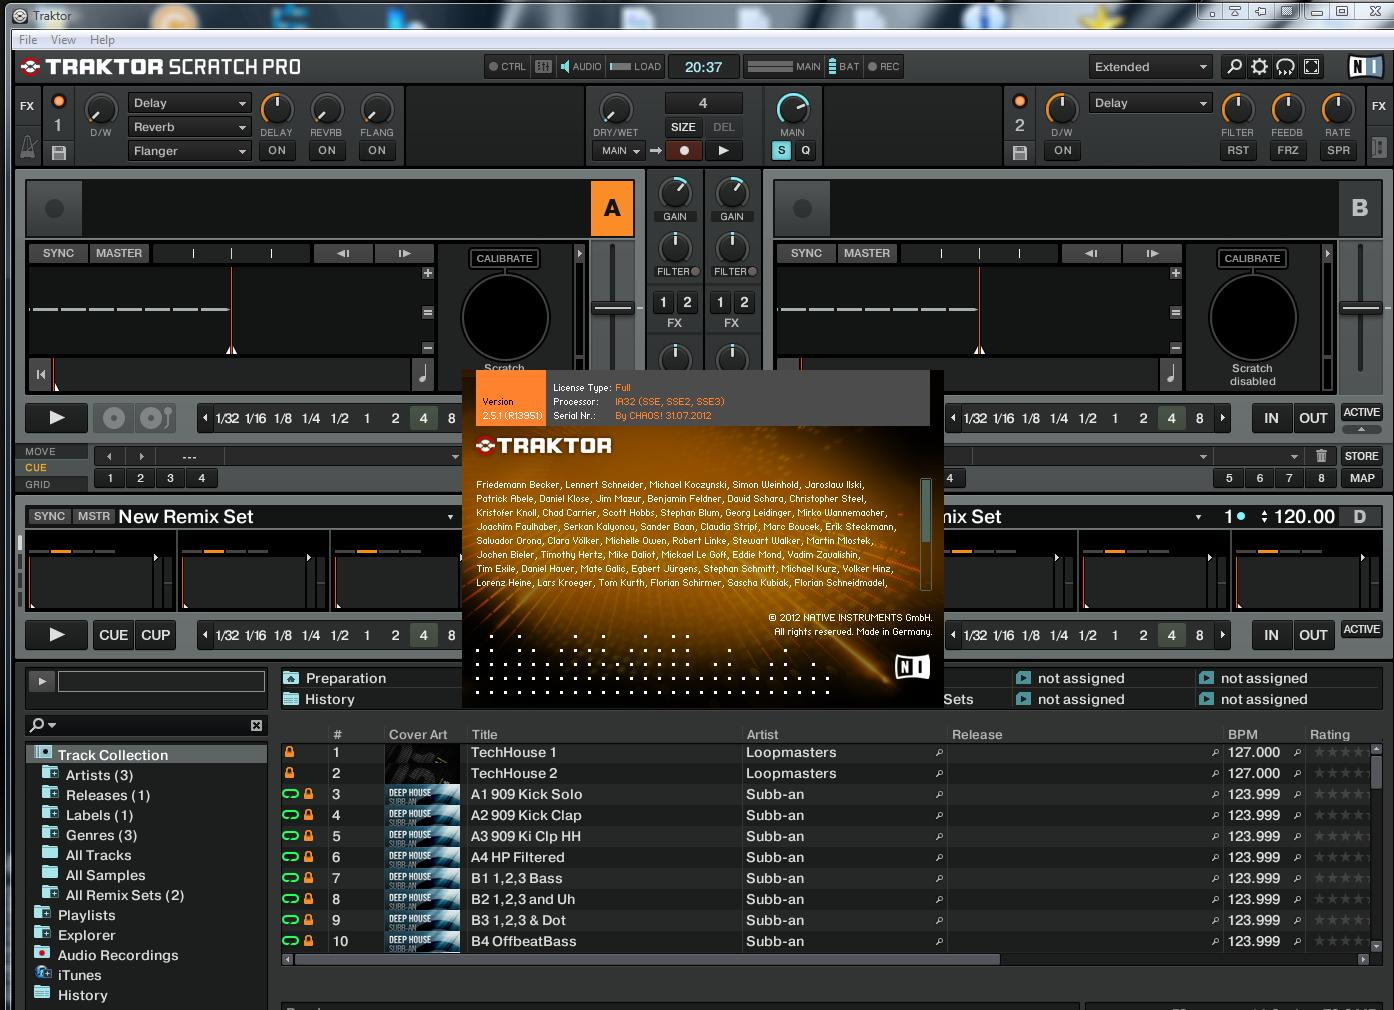 download traktor scratch pro 2 (mac os x) full version